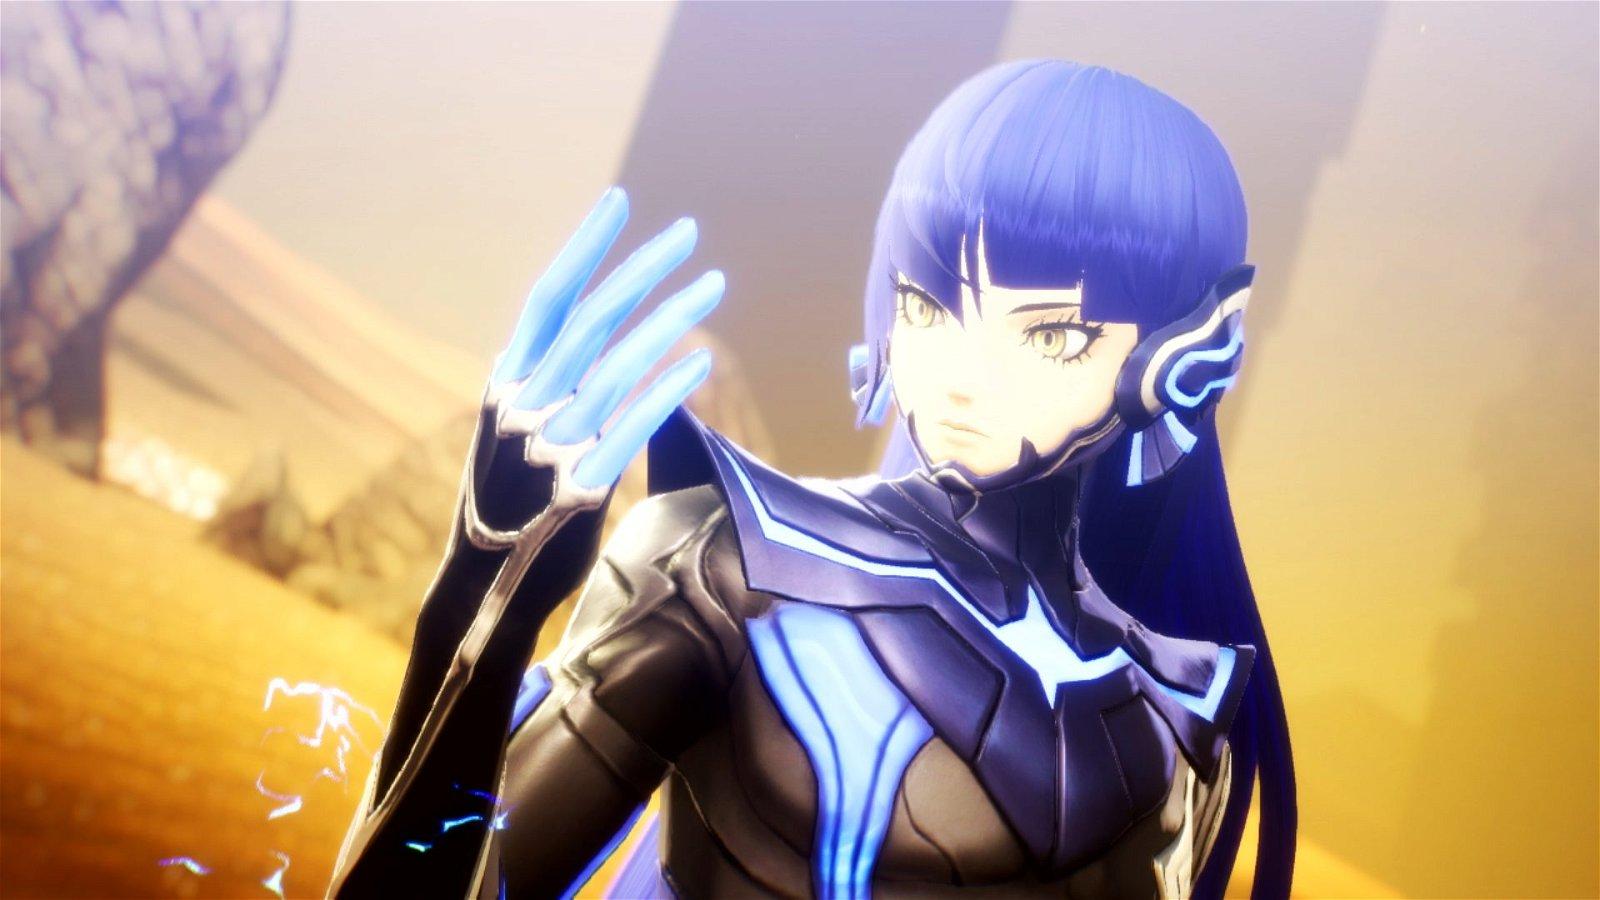 Atlus Offers A Fresh Look into Shin Megami Tensei V's Apocalyptic World